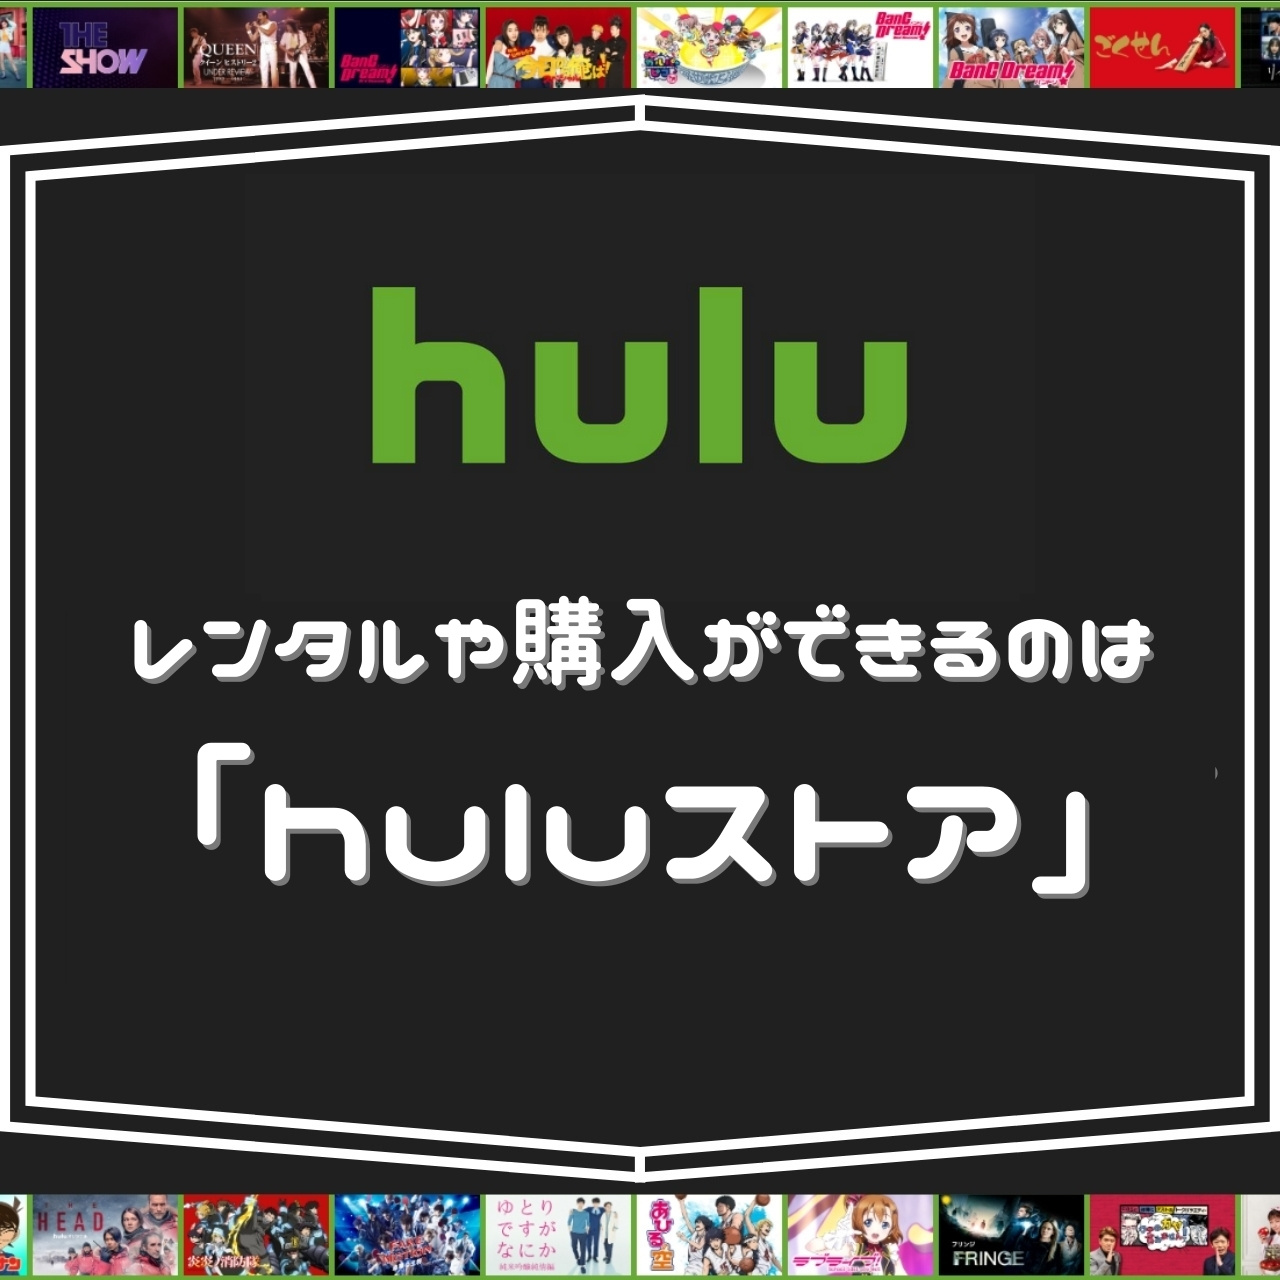 huluでレンタルや購入ができるのは「huluストア」